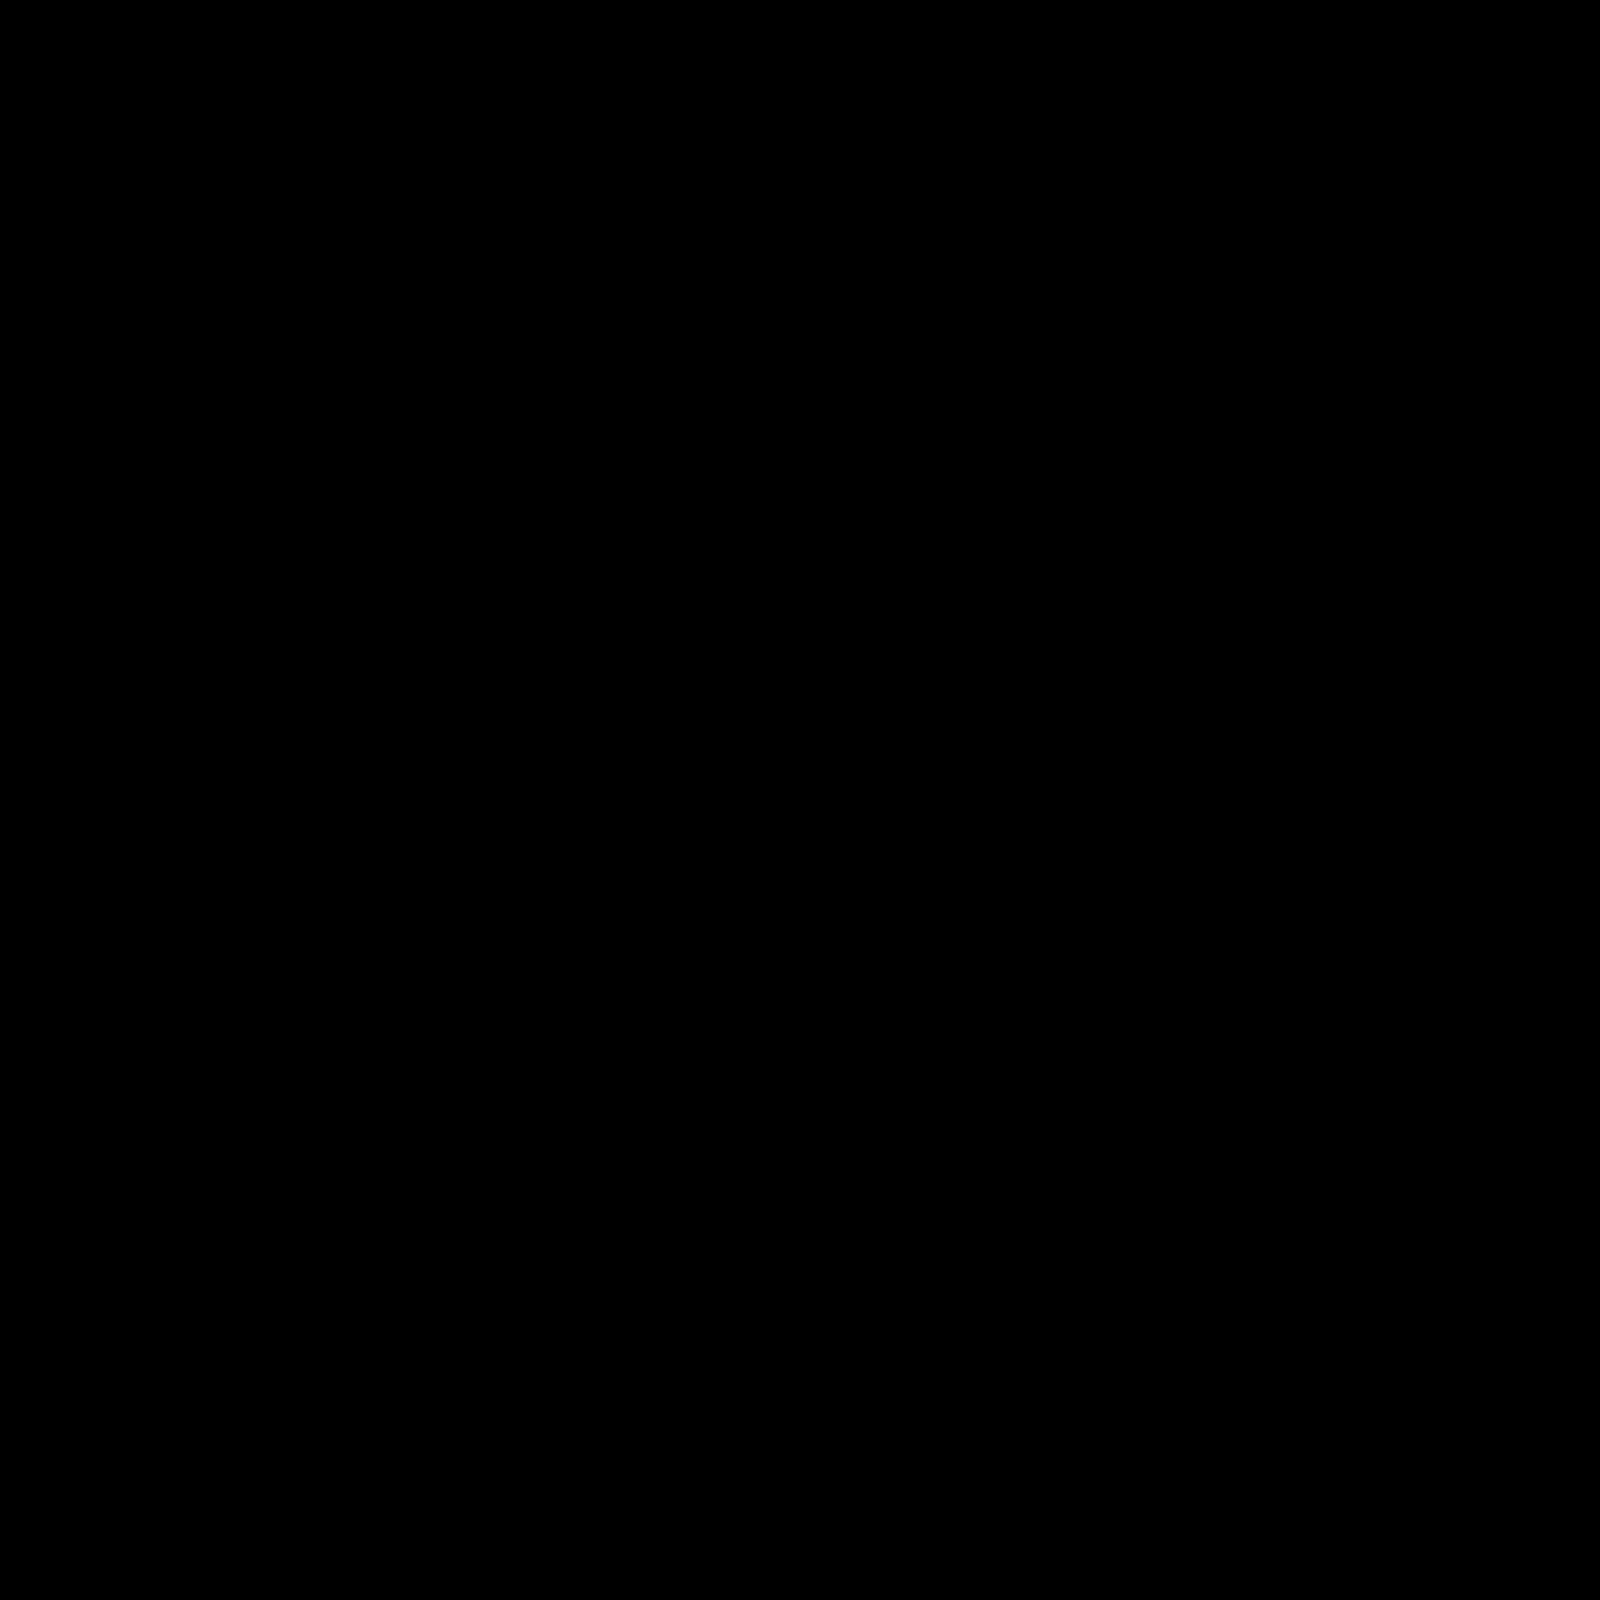 Brass Manifold icon